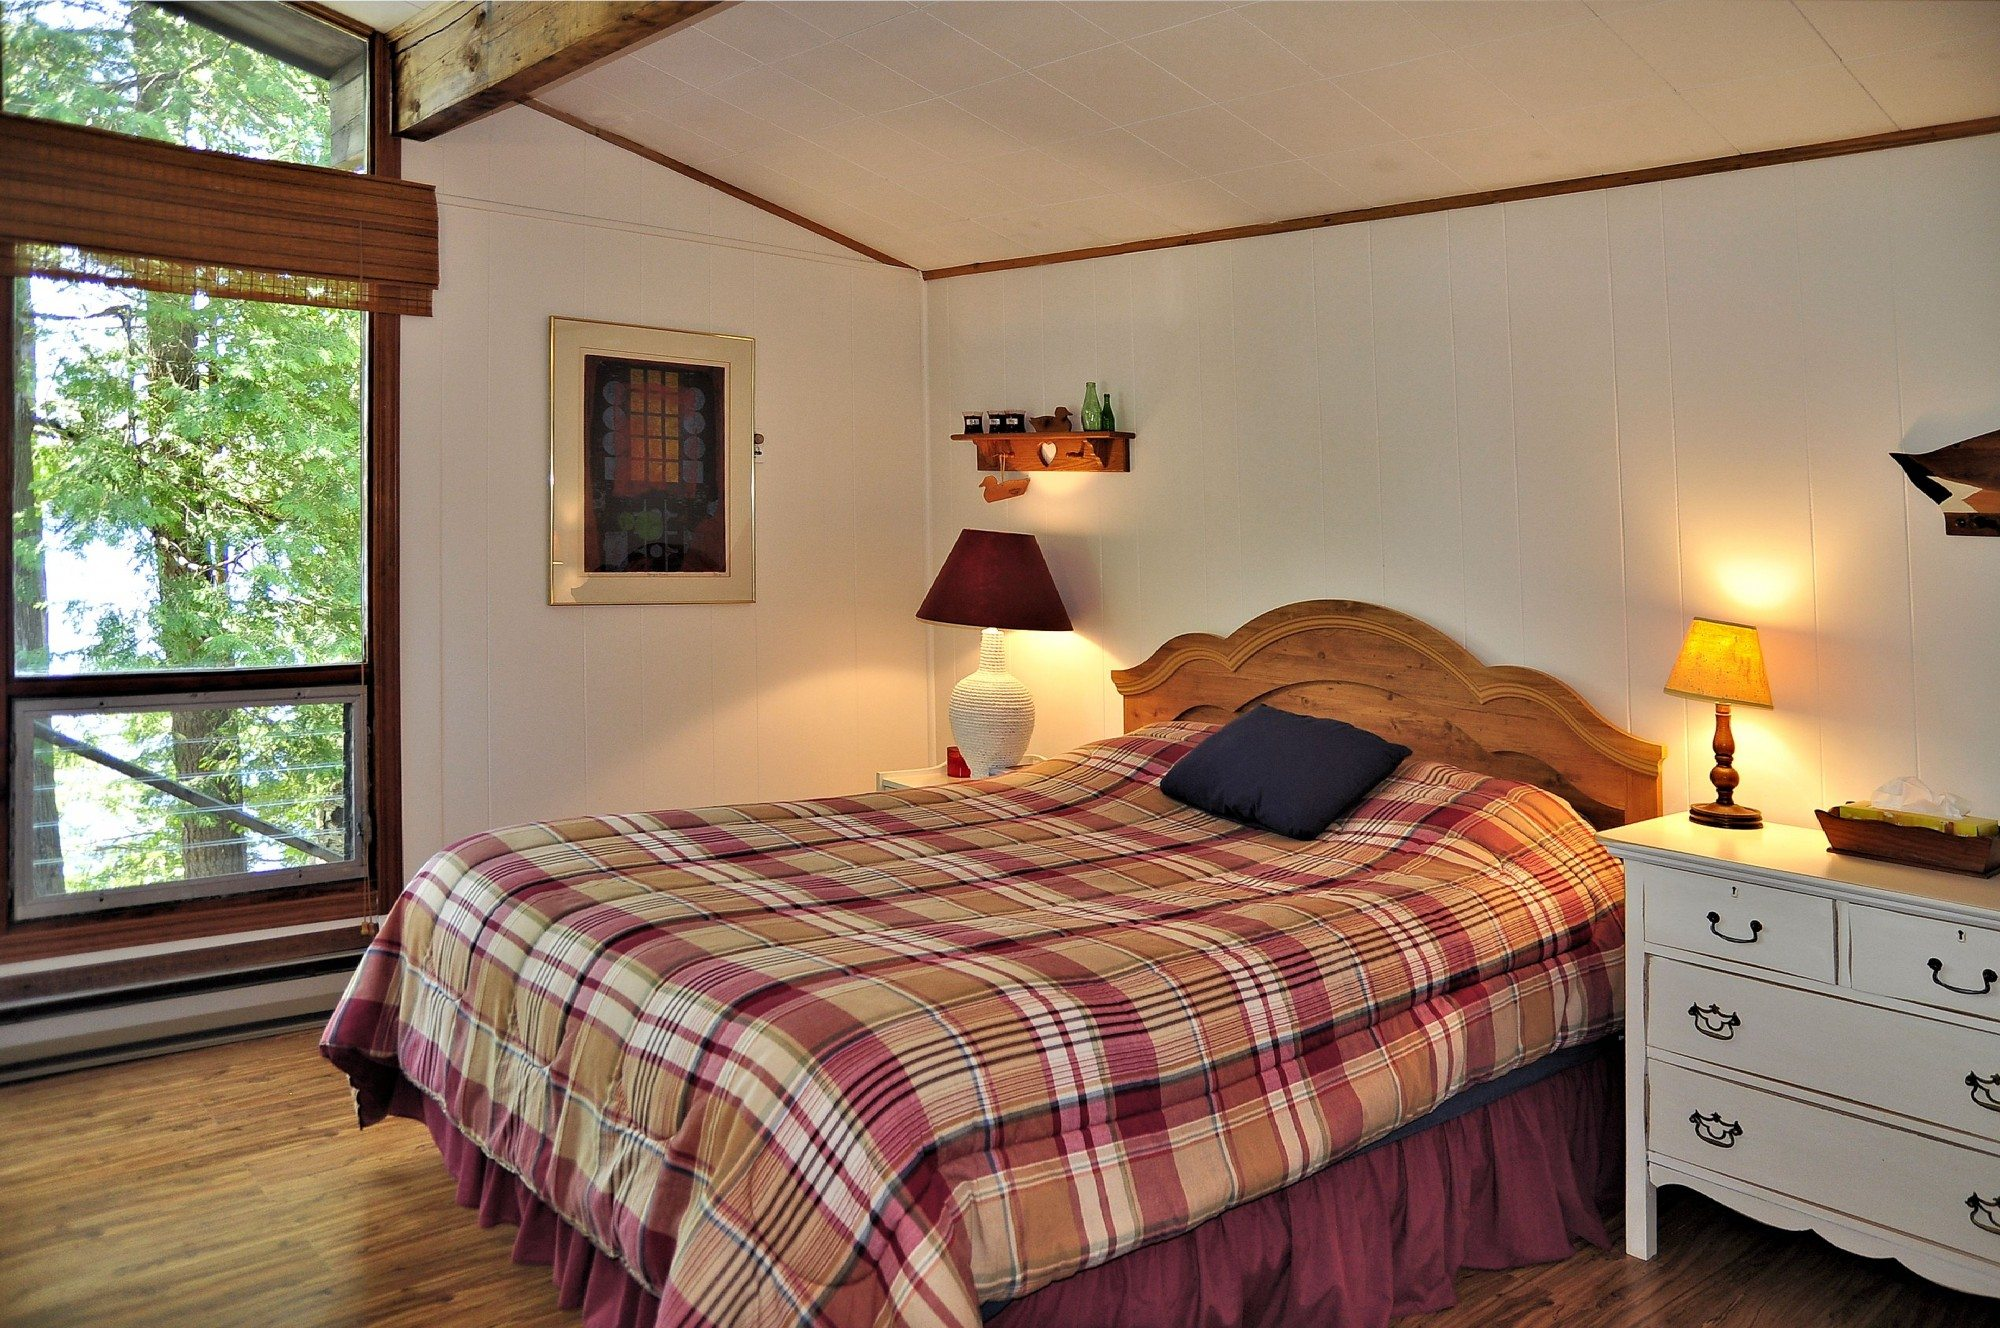 kawartha-lakes-cottage-for-sale-315-crego-lake-road-7